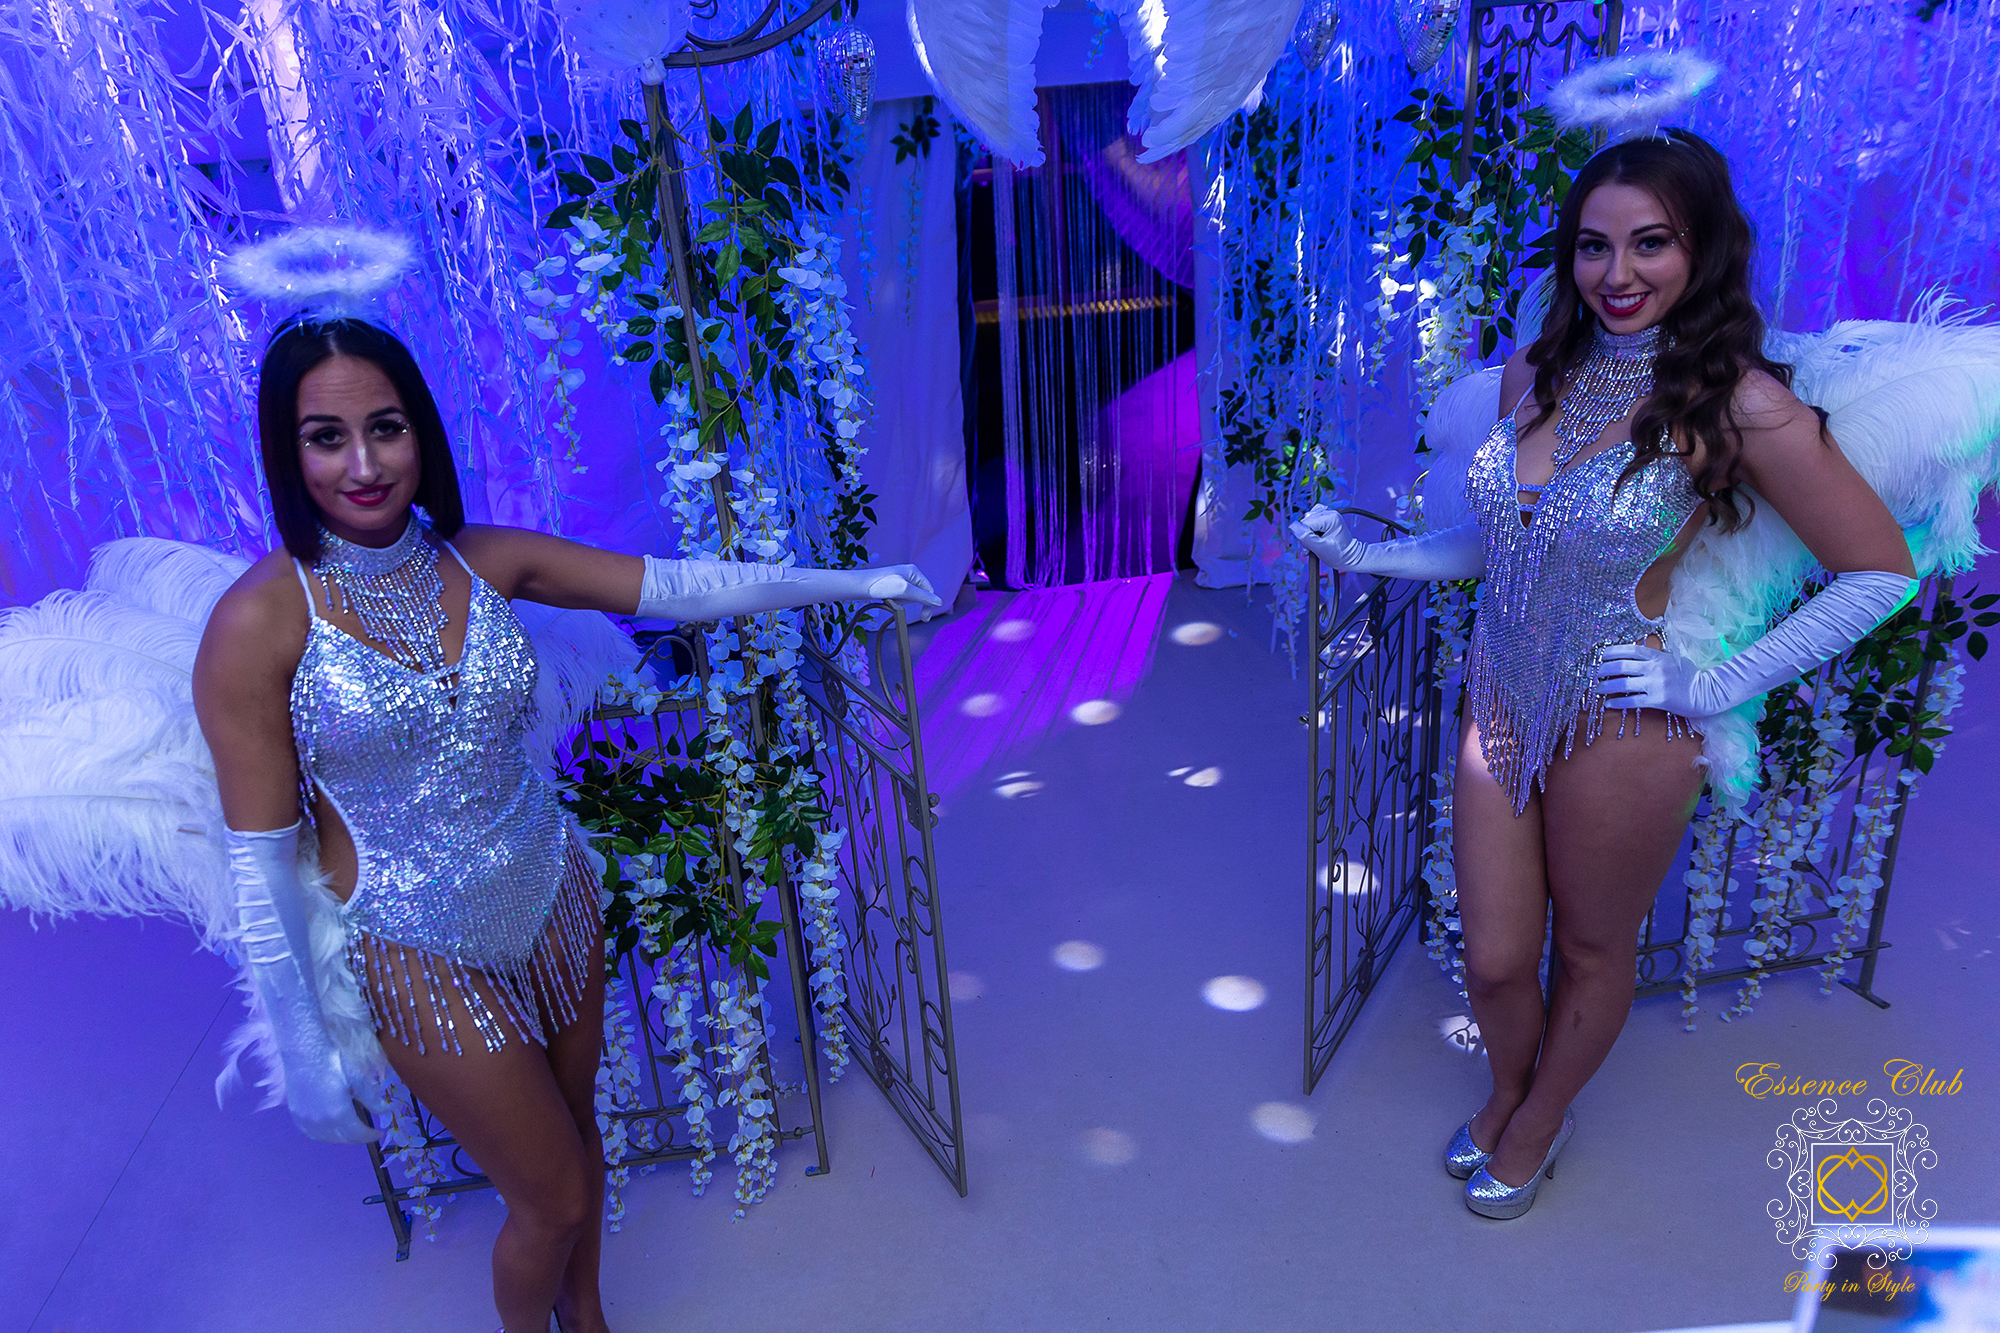 Heaven gate dancers